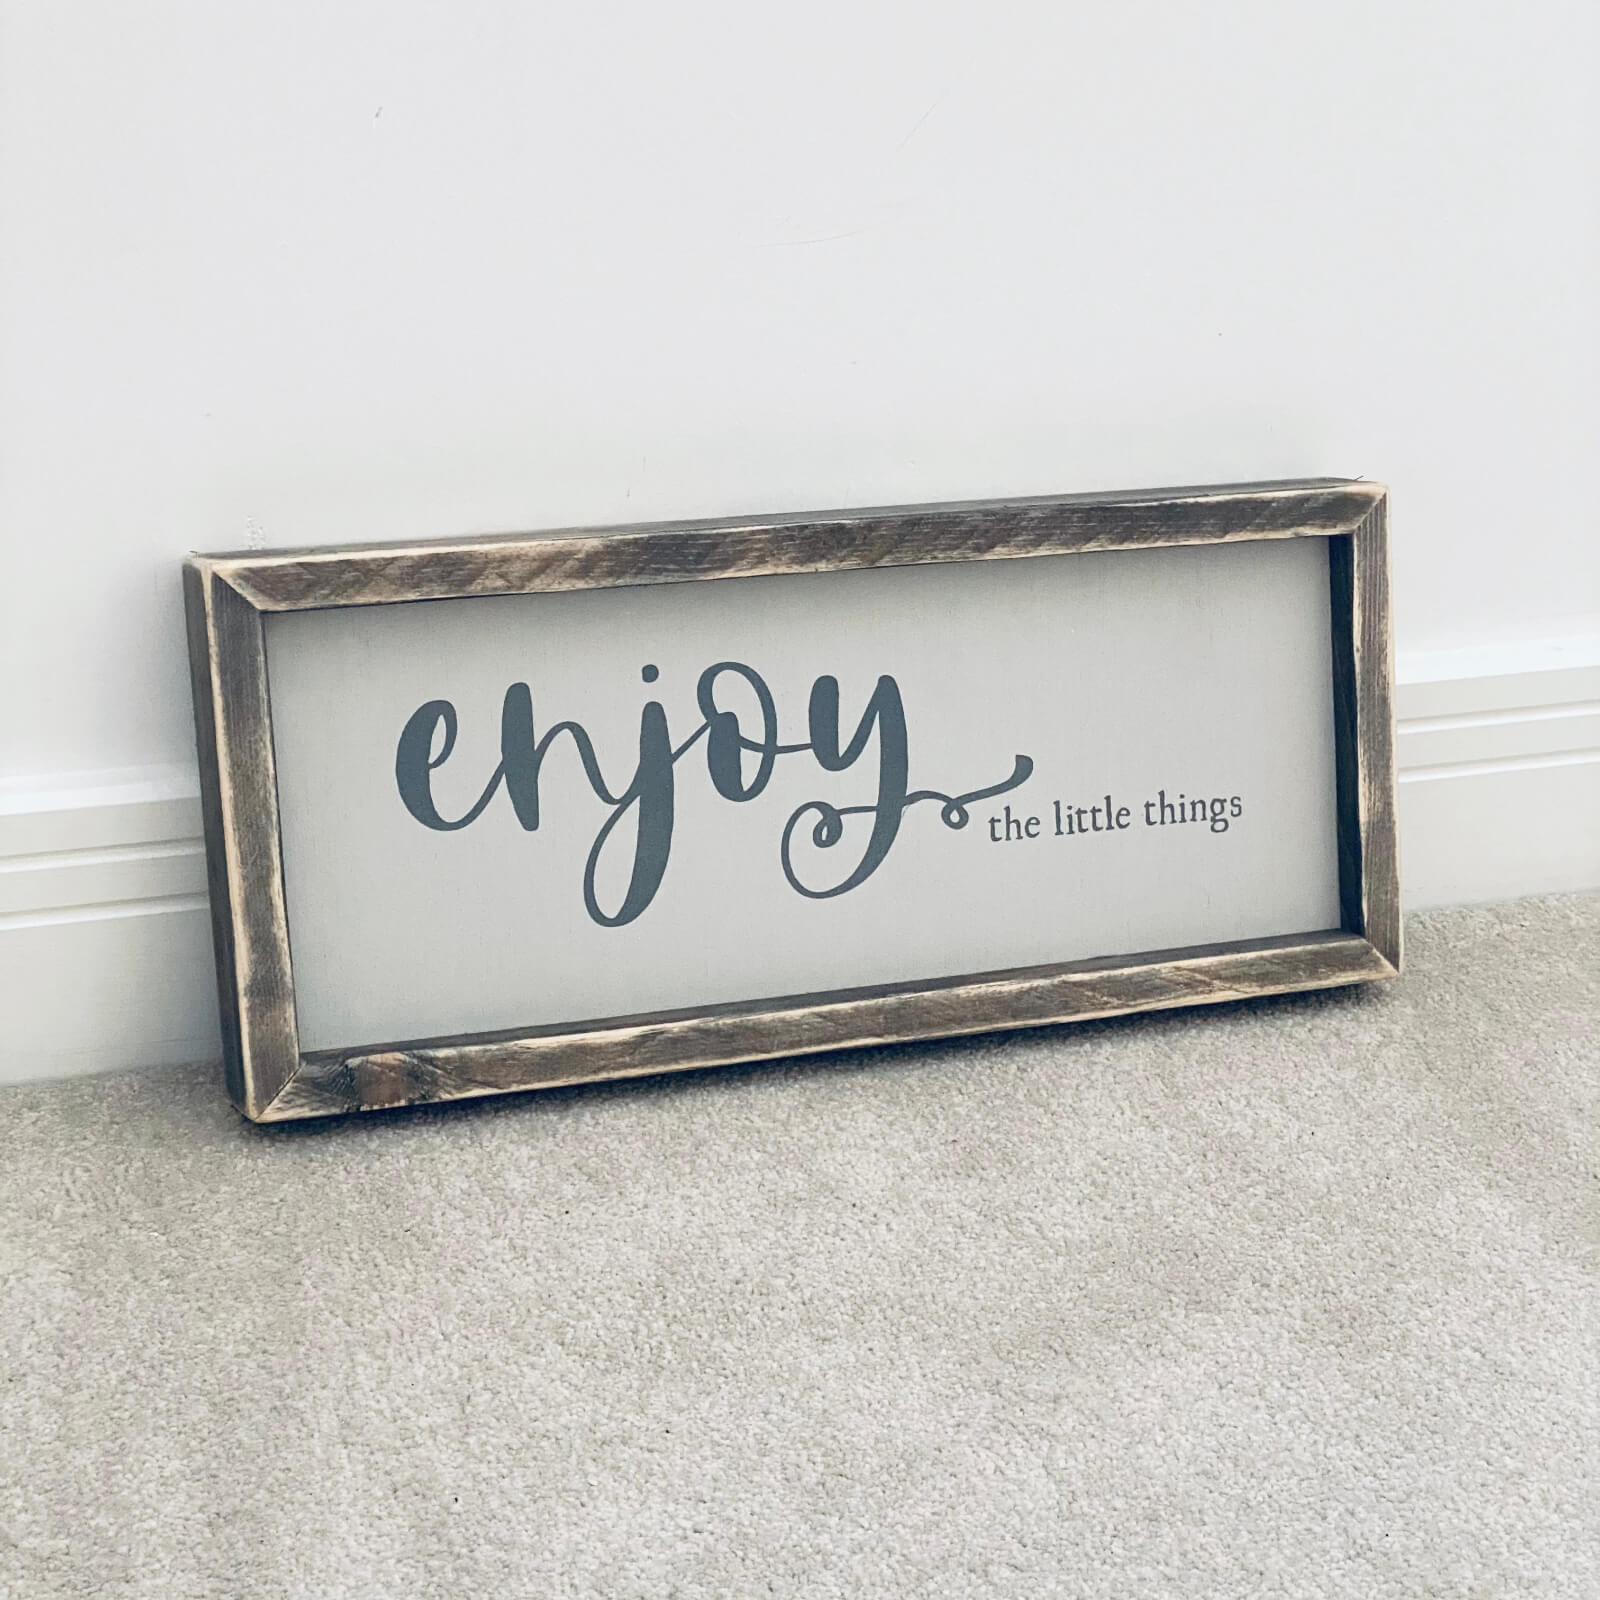 Enjoy The Little Things – Framed Wooden Sign Kind Shop